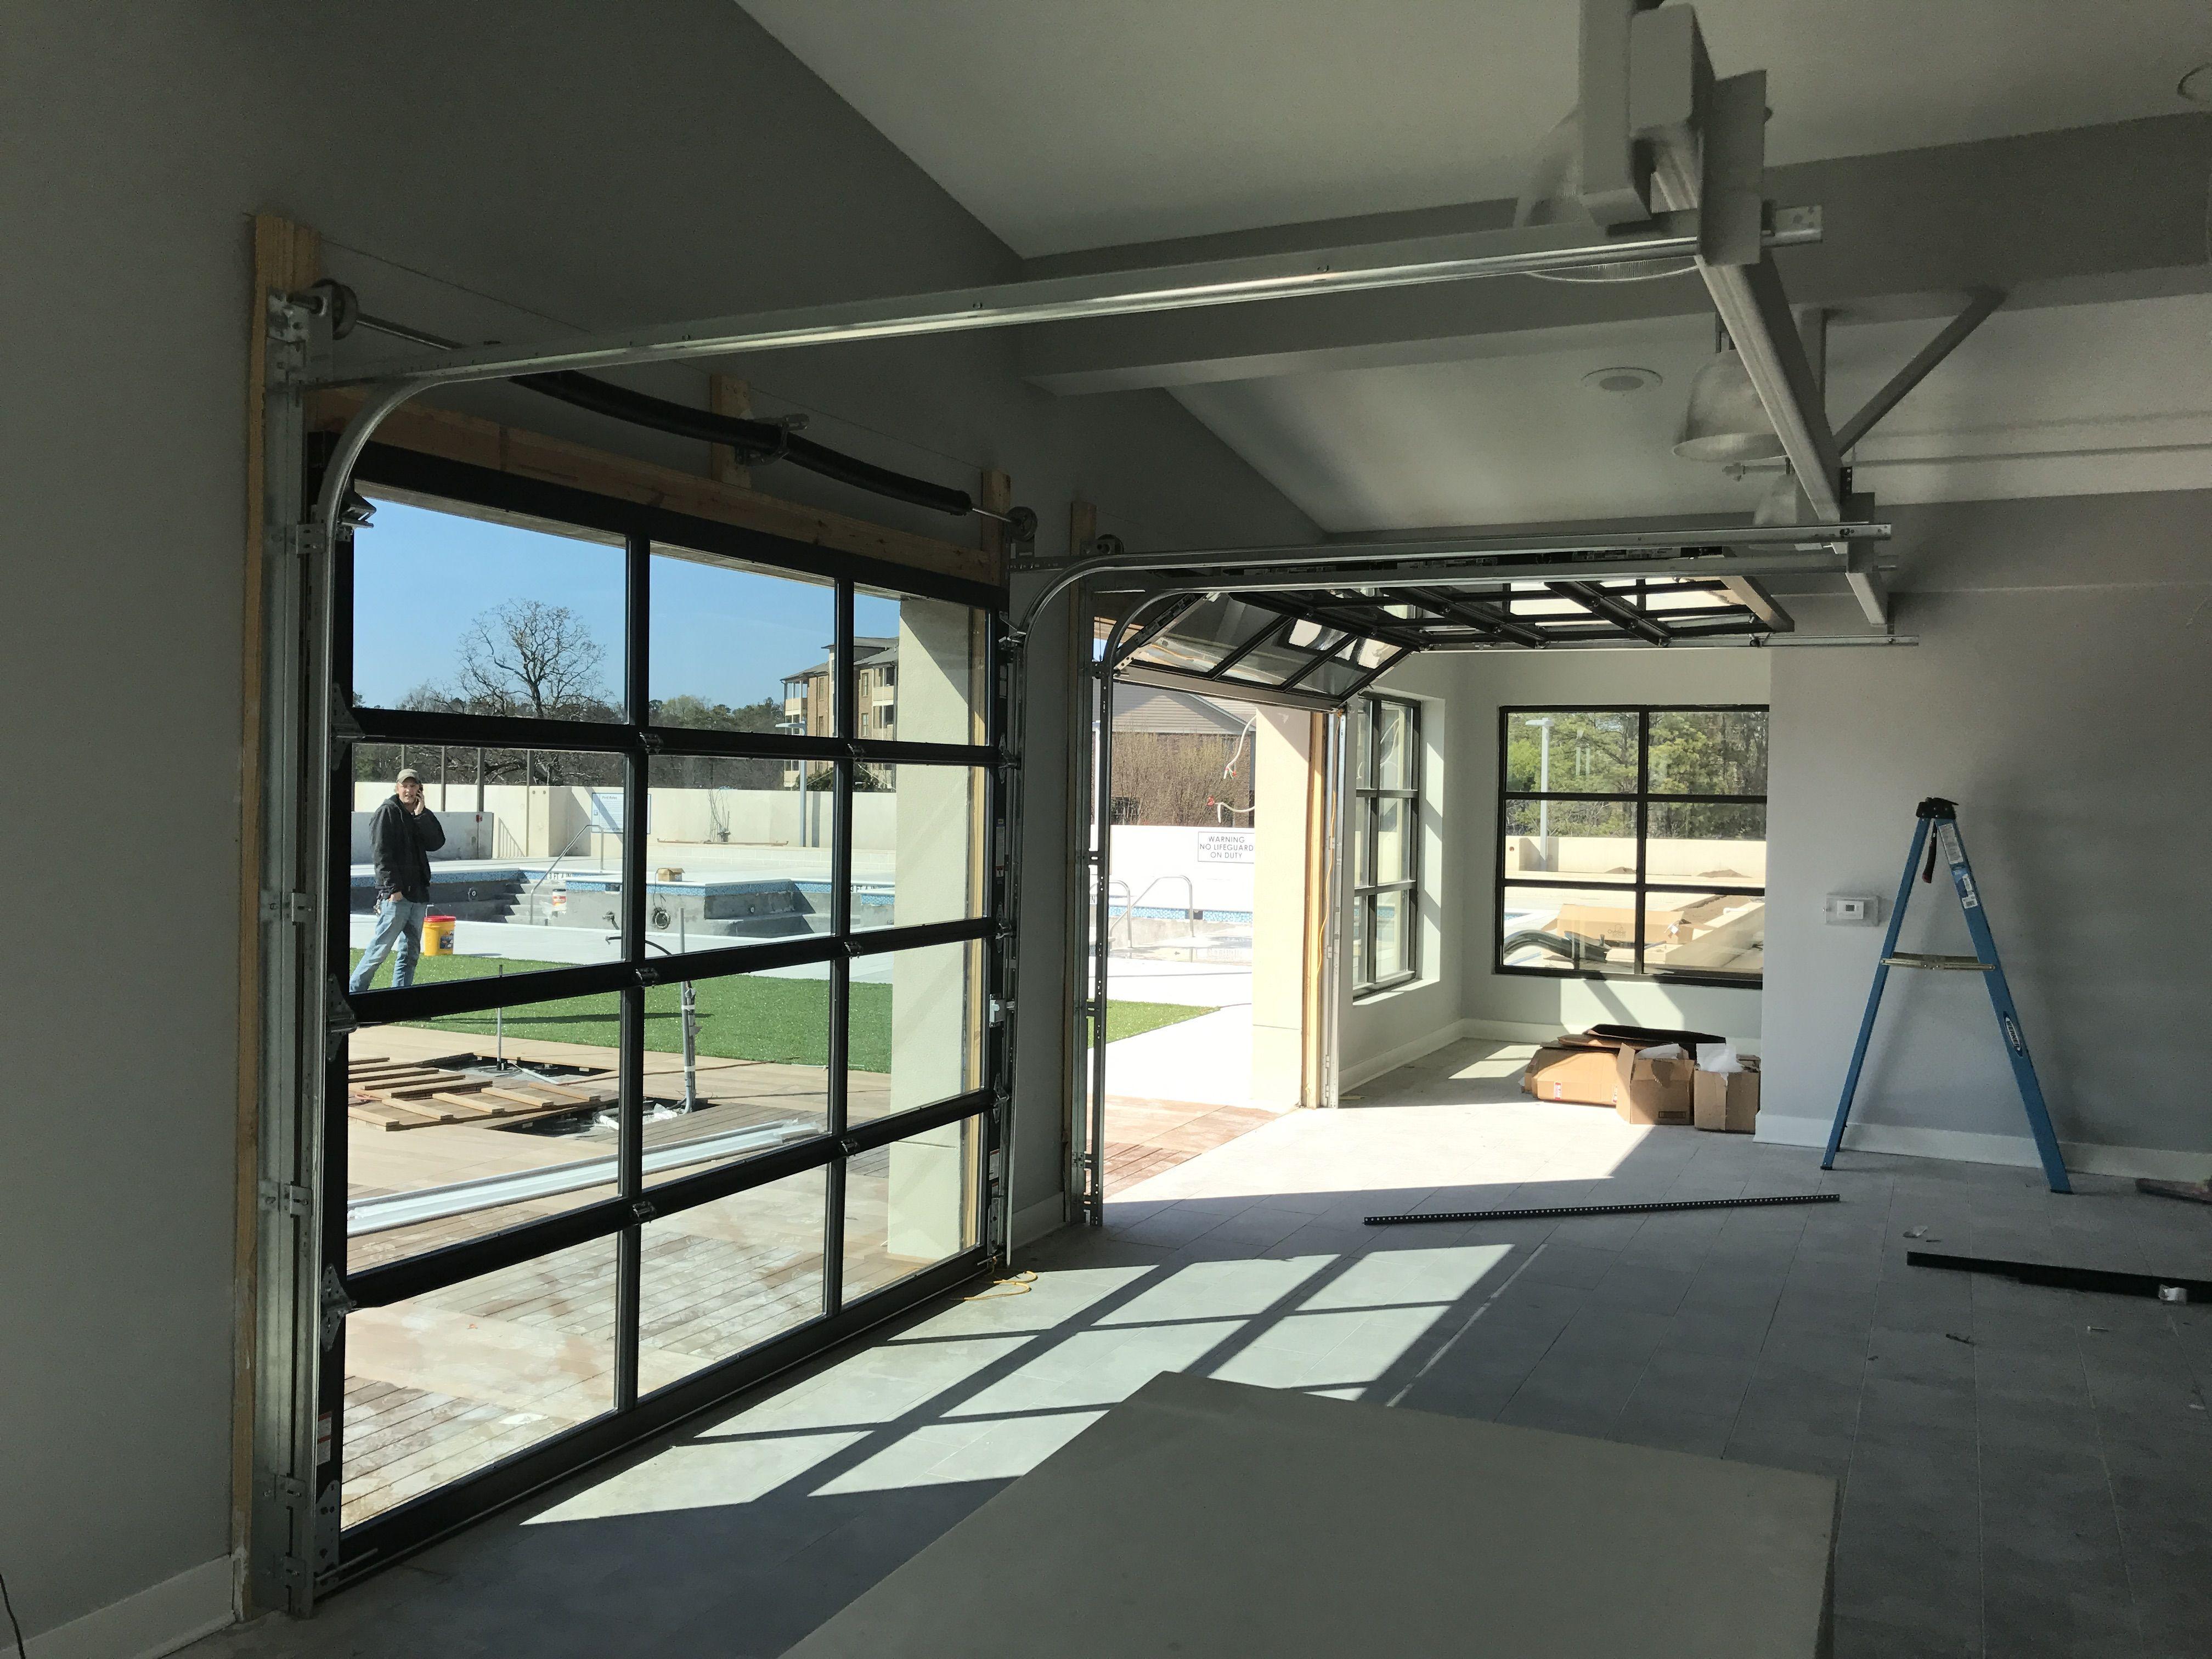 Full View Glass Garage Door Separating Game Room From Outdoor